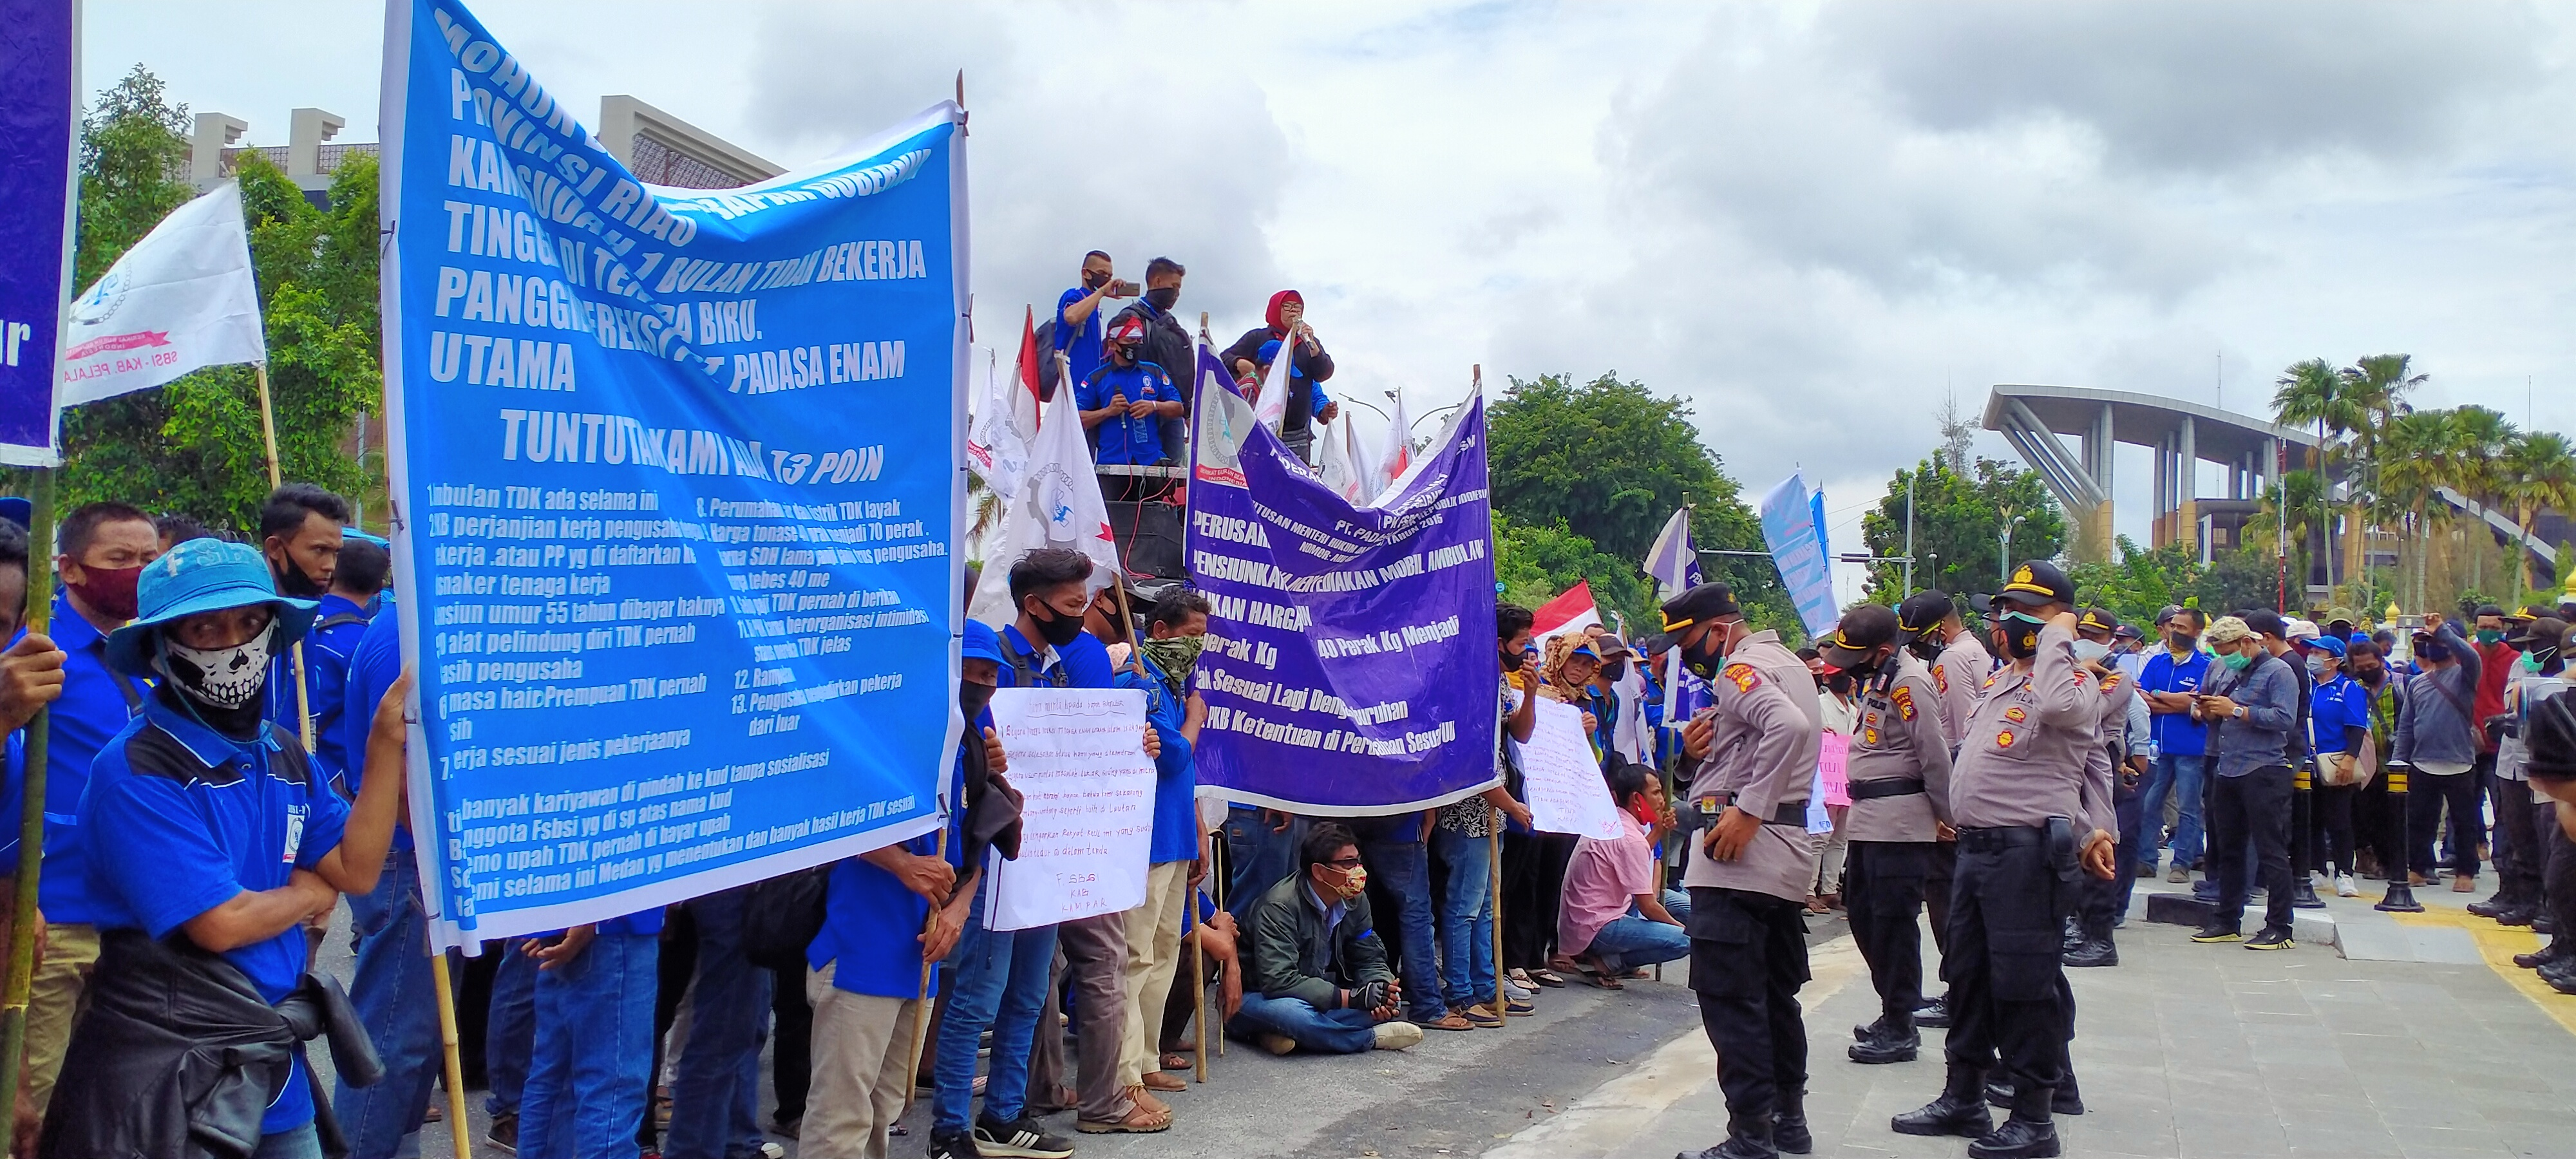 Video: Ratusan Massa Buruh Yang Berunjuk Rasa Di Depan Kantor Gubernur Riau Dibubarkan Paksa Kepolisian